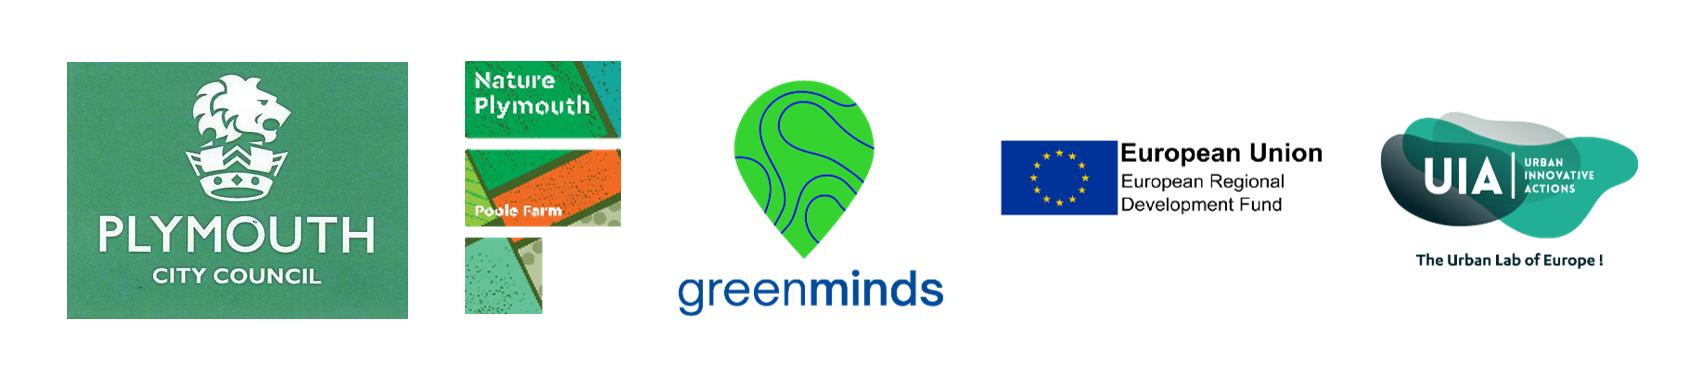 PF&GM logos.